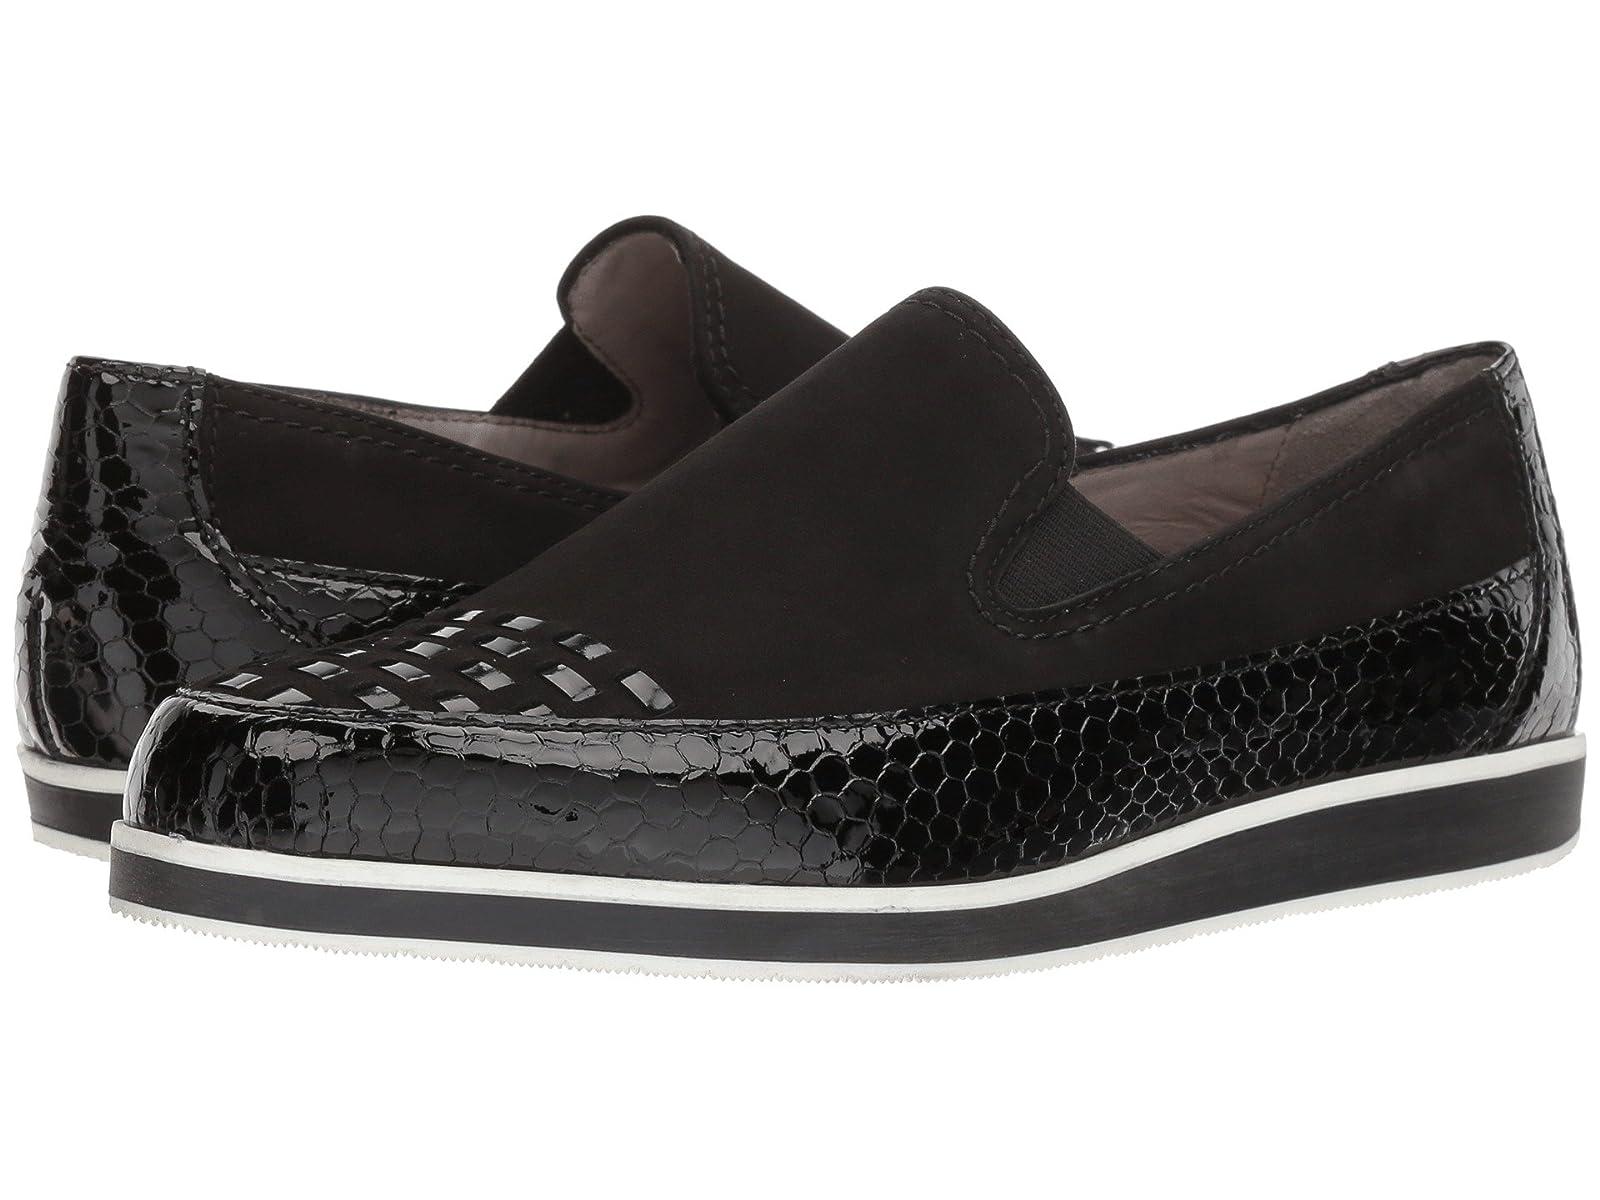 ara LaurelCheap and distinctive eye-catching shoes